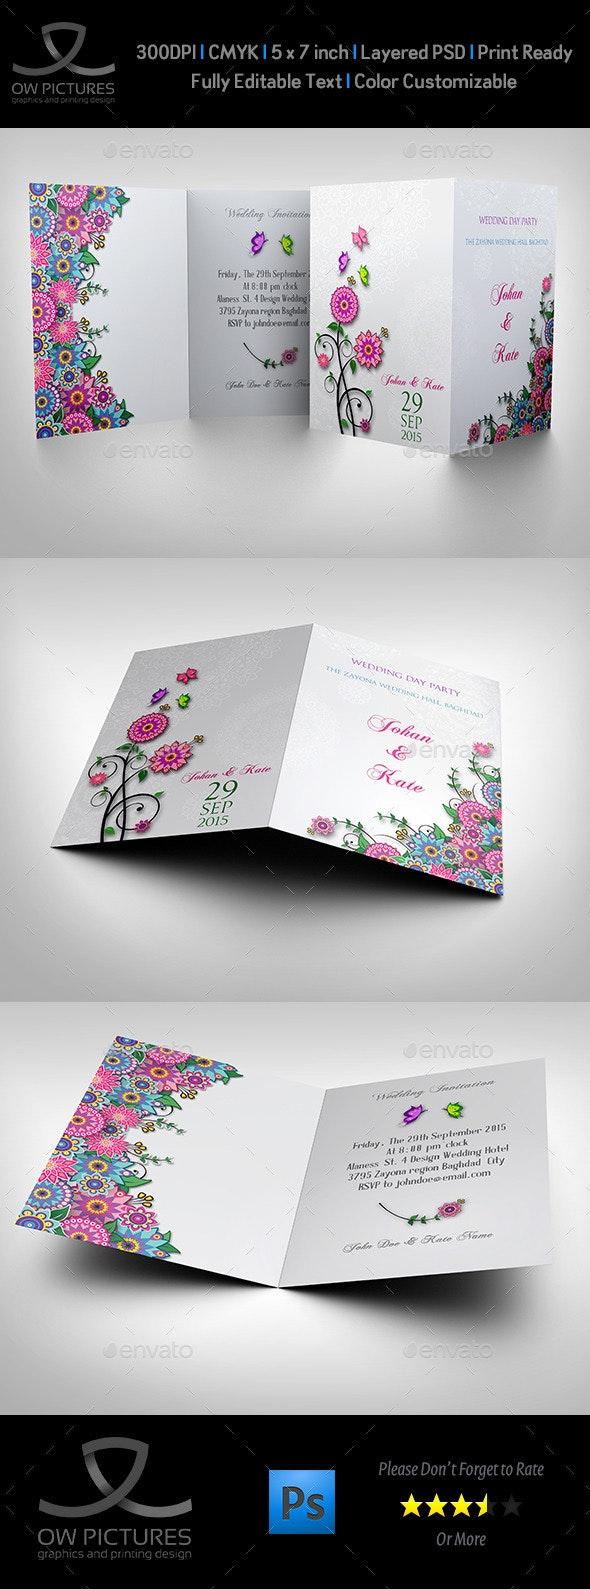 Wedding Invitation Card Template Vol.11 - Weddings Cards & Invites